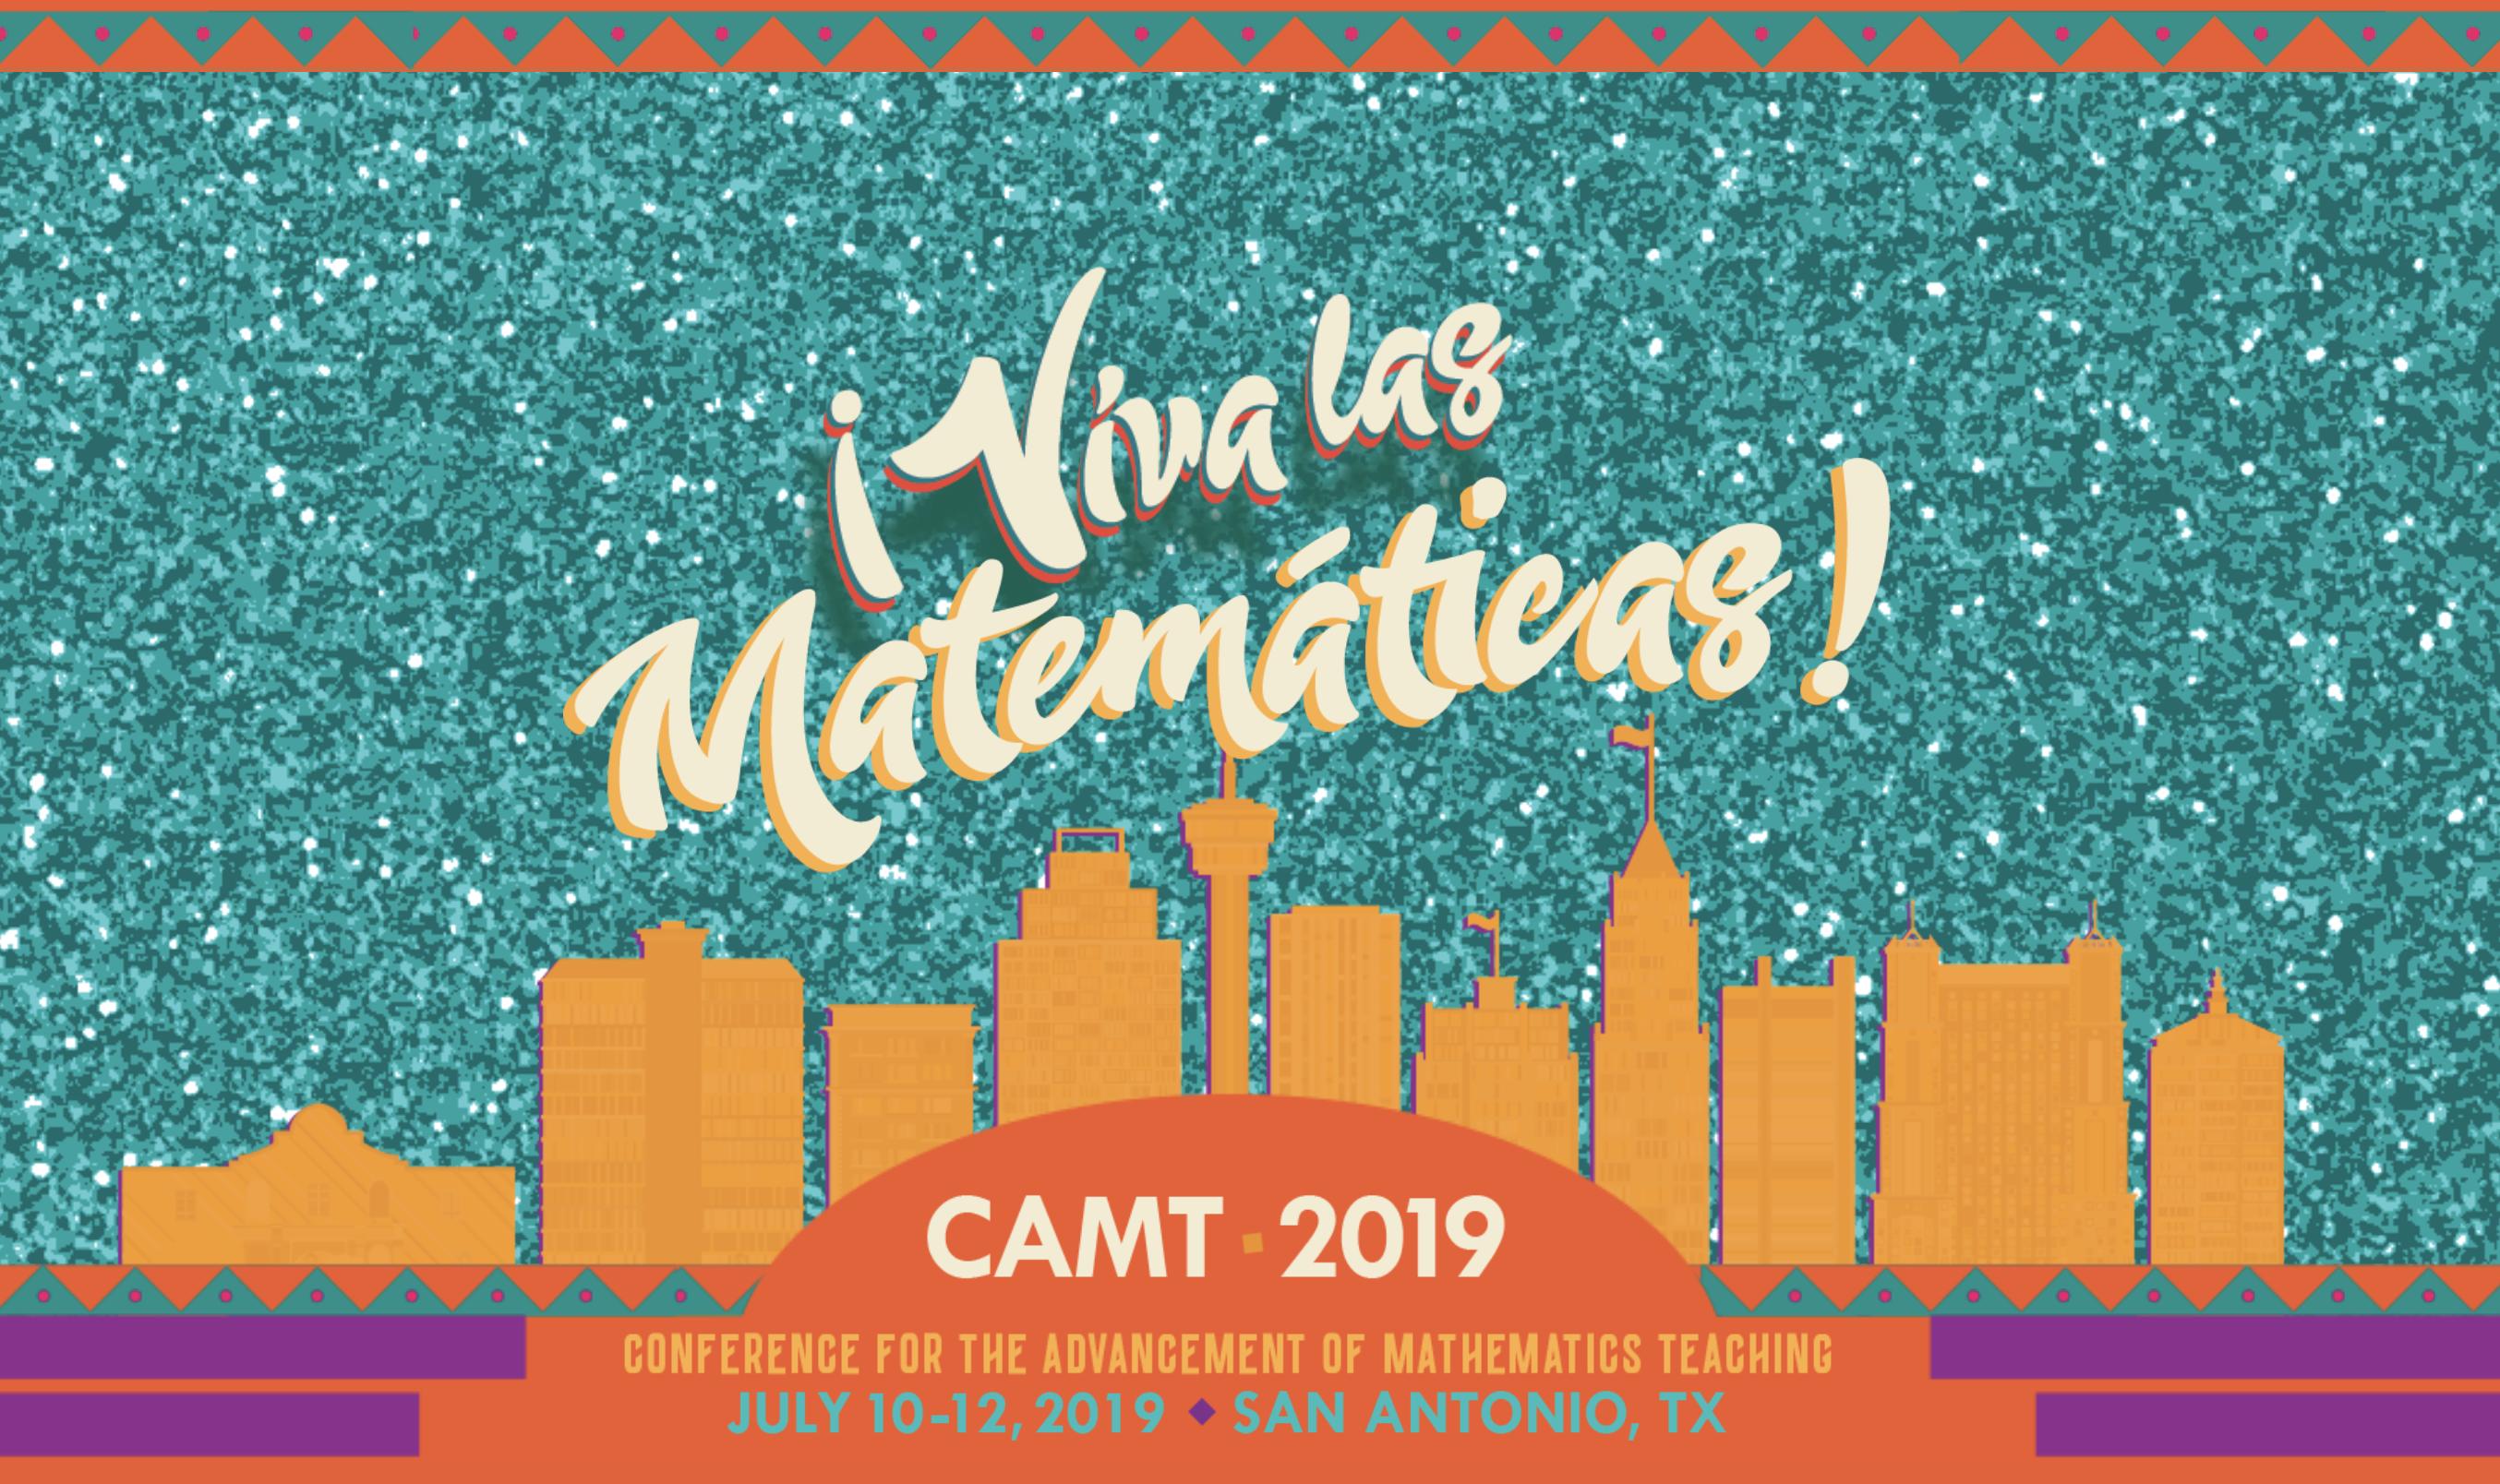 CAMT 2019 — Get More Math!